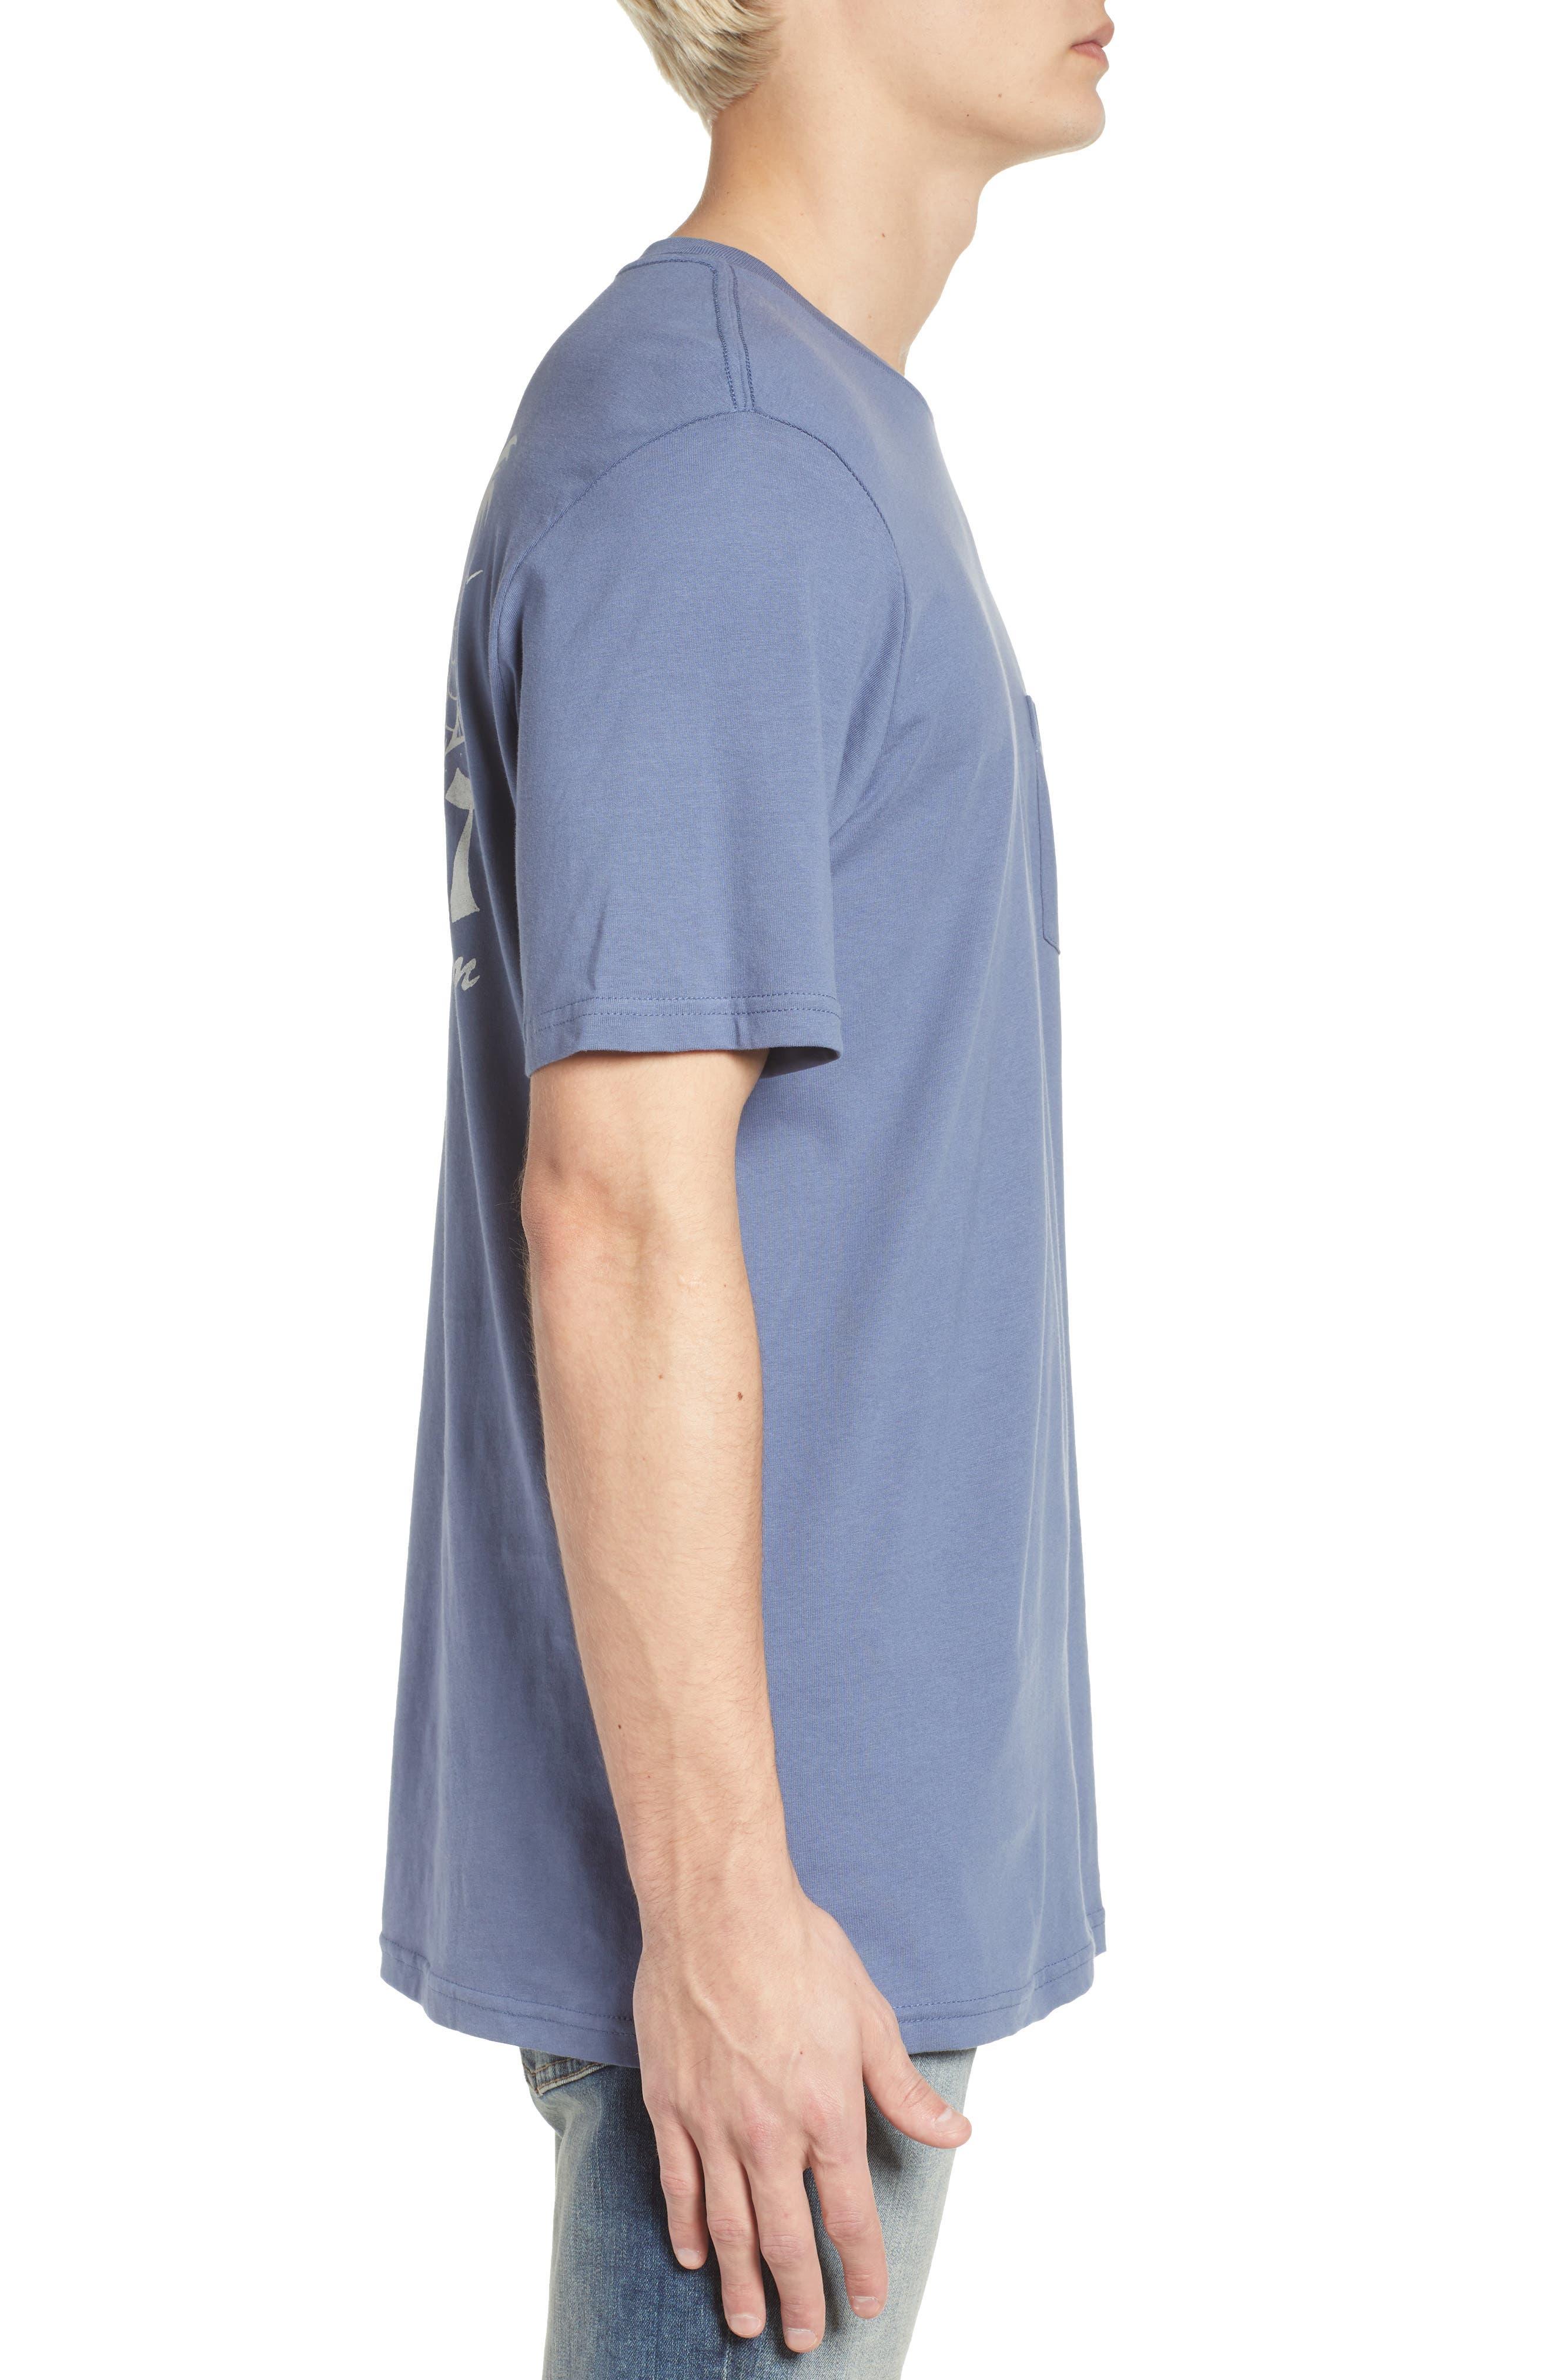 Last Resort Pocket T-Shirt,                             Alternate thumbnail 3, color,                             Deep Blue